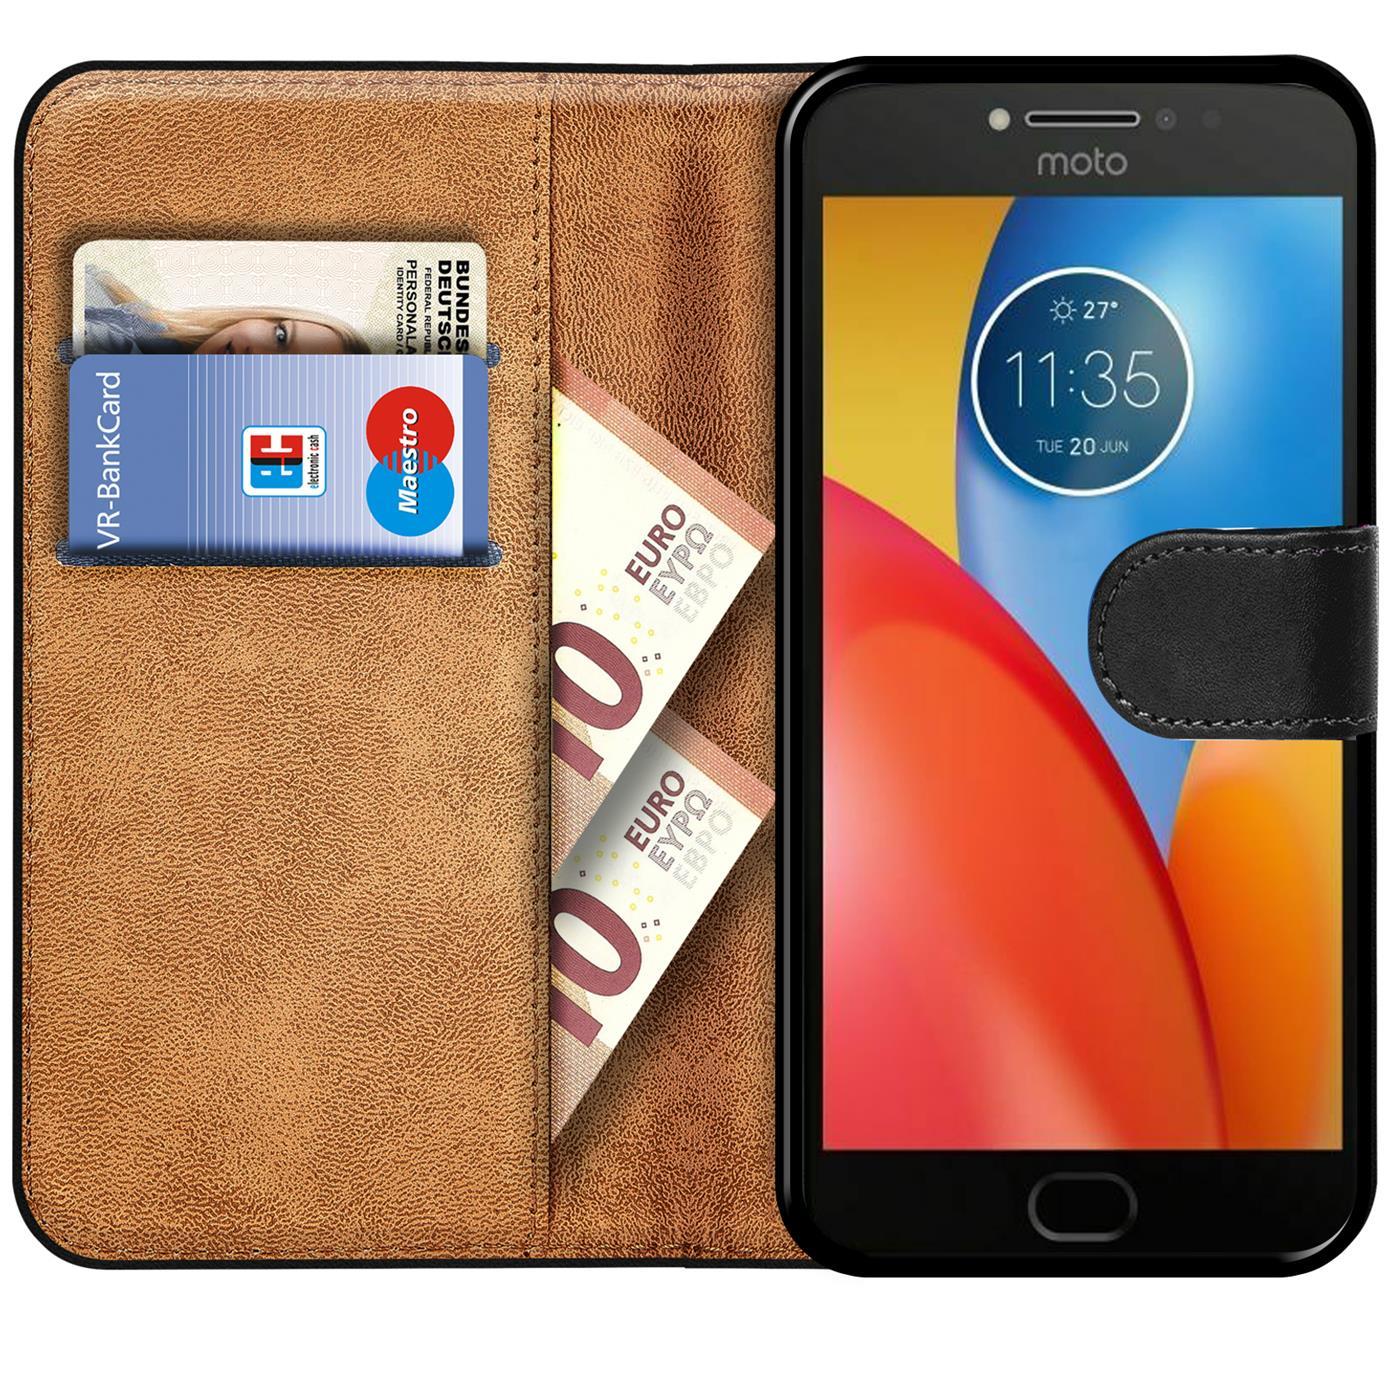 Book-Case-fuer-Motorola-Moto-E4-Huelle-Tasche-Flip-Cover-Handy-Schutz-Huelle Indexbild 9